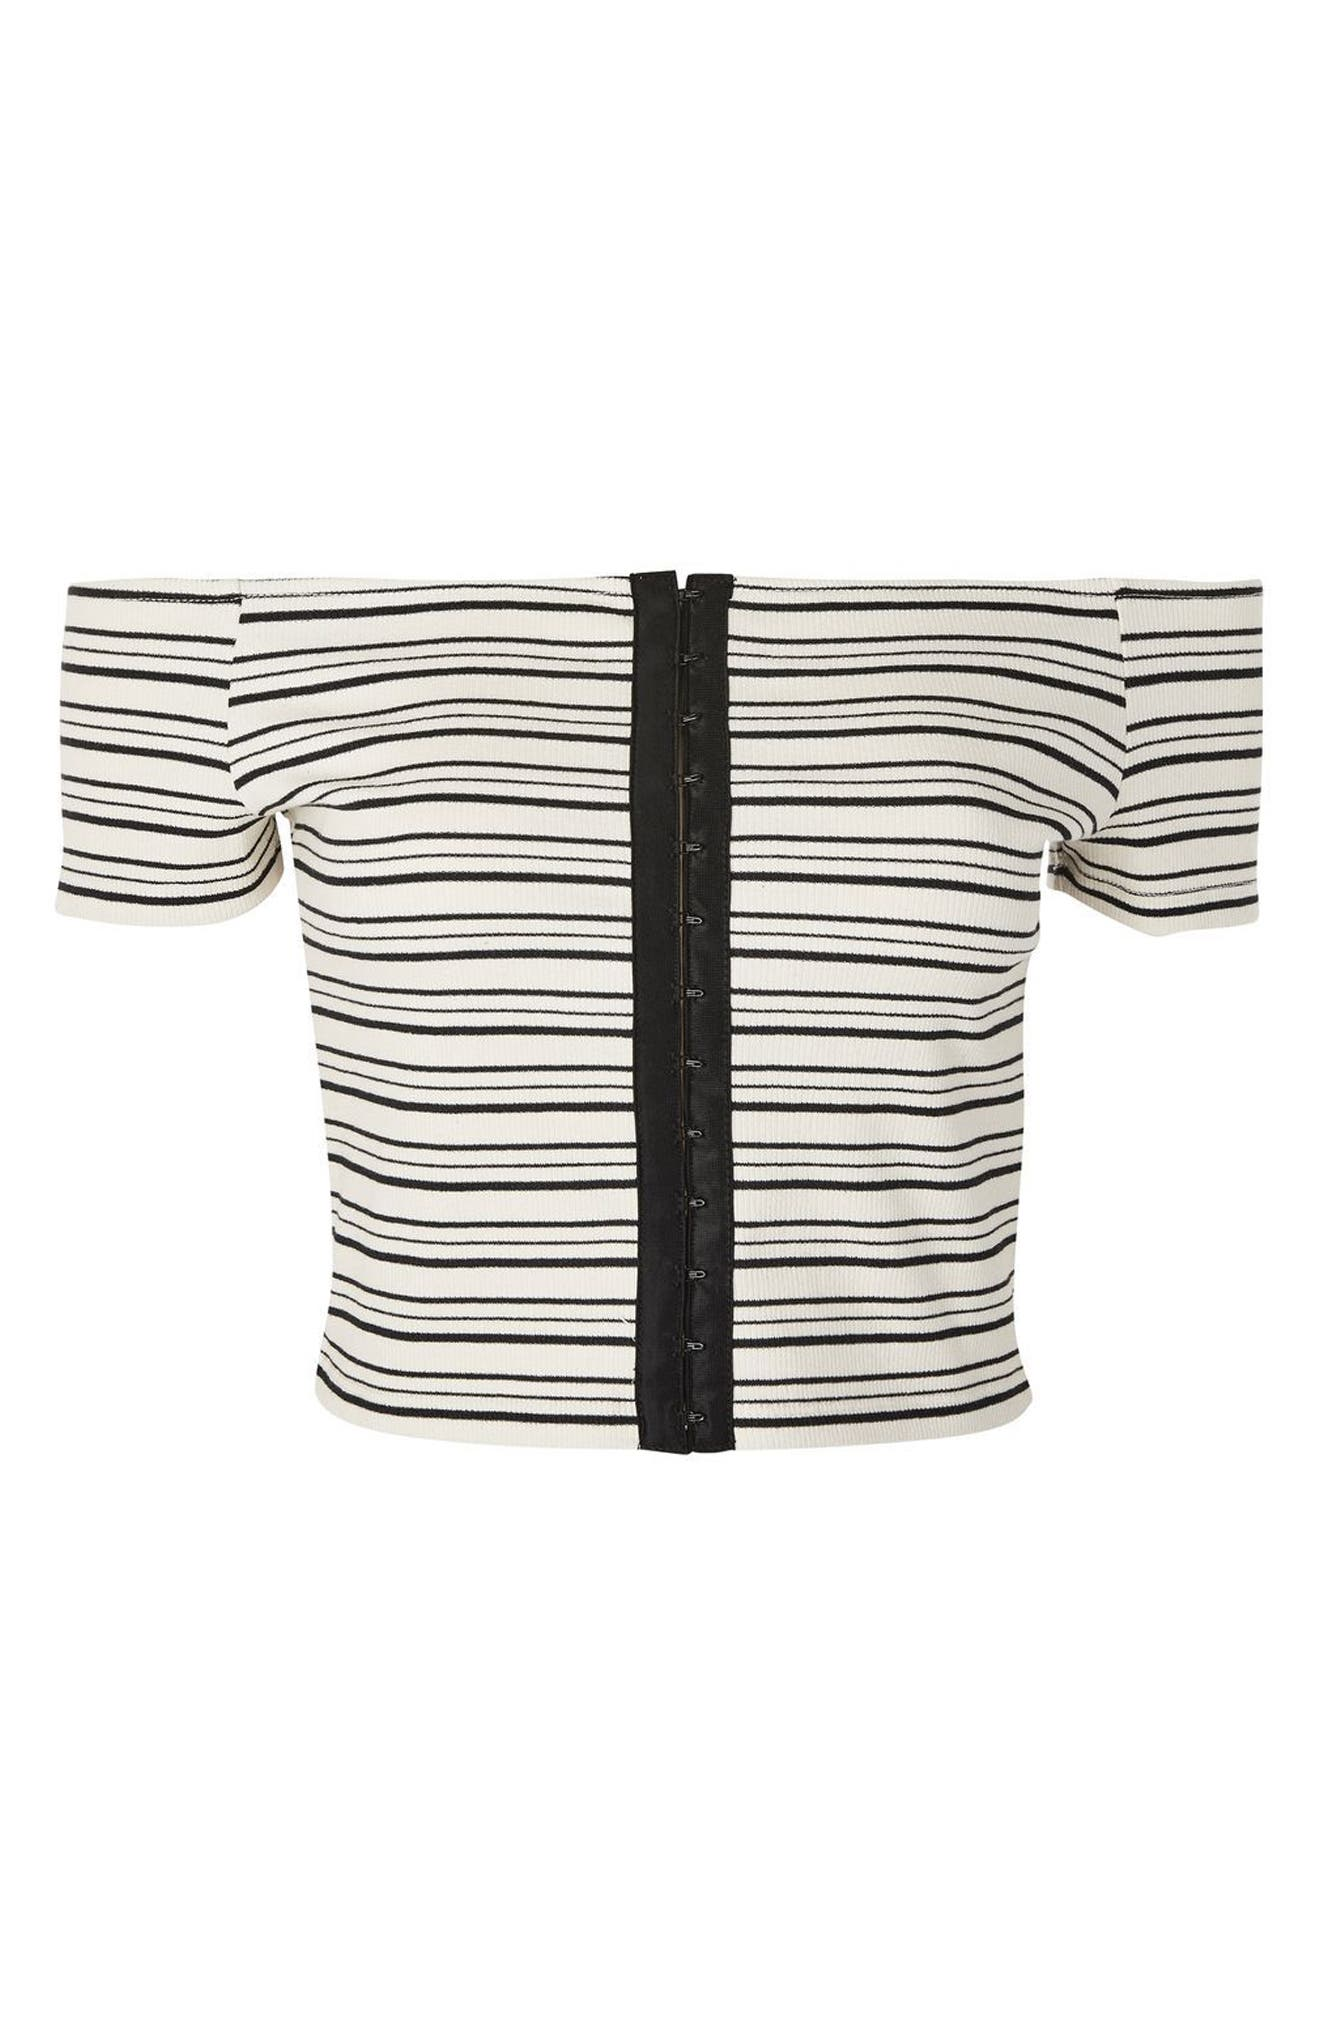 Stripe Off the Shoulder Crop Top,                             Alternate thumbnail 3, color,                             Black Multi